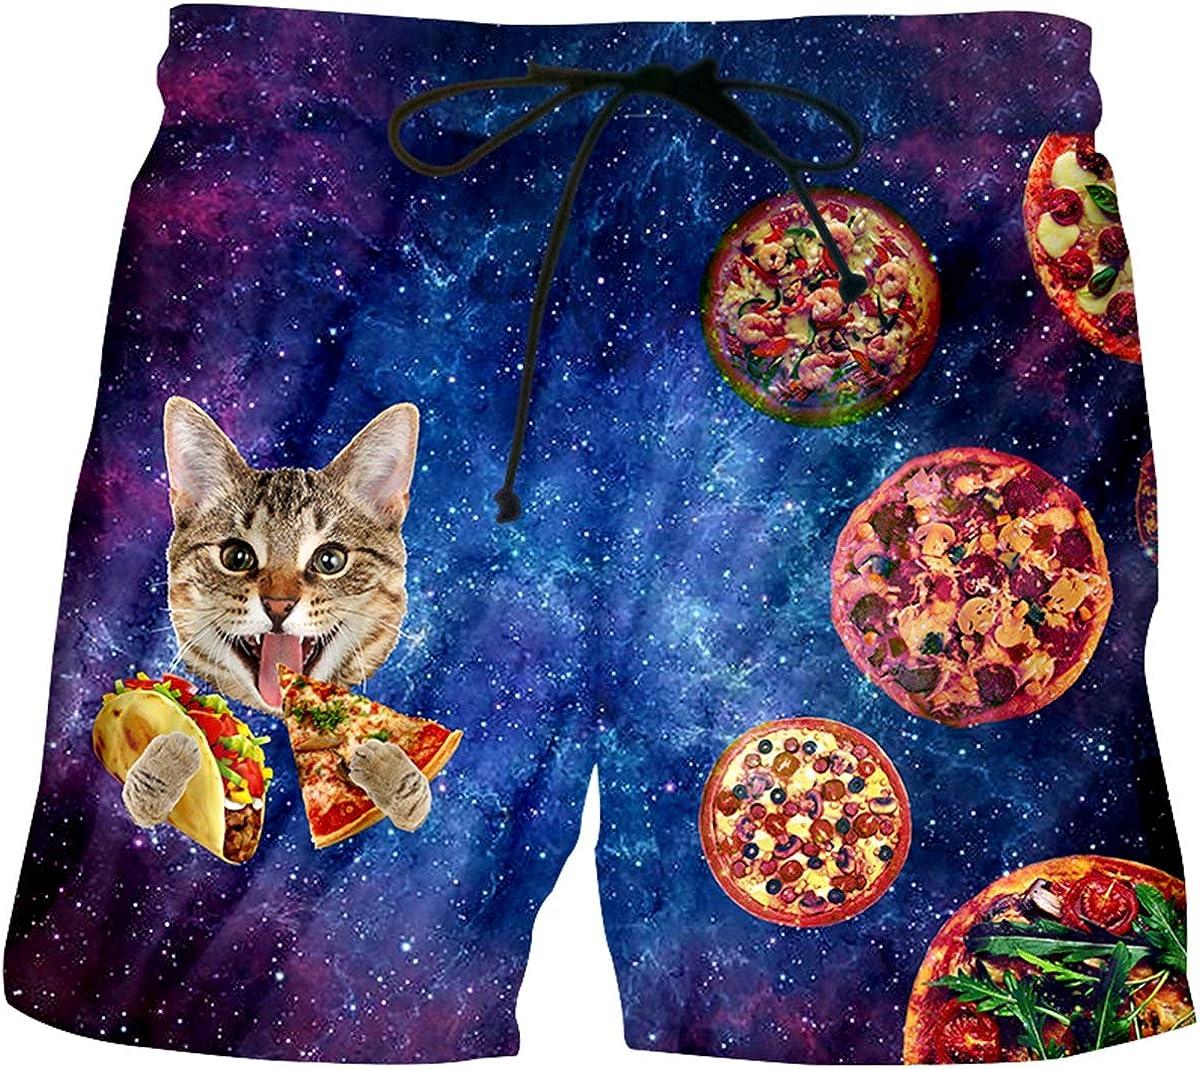 pinata Cat Mens Shorts Casual Graphic Medium Length Swim Shorts for Men